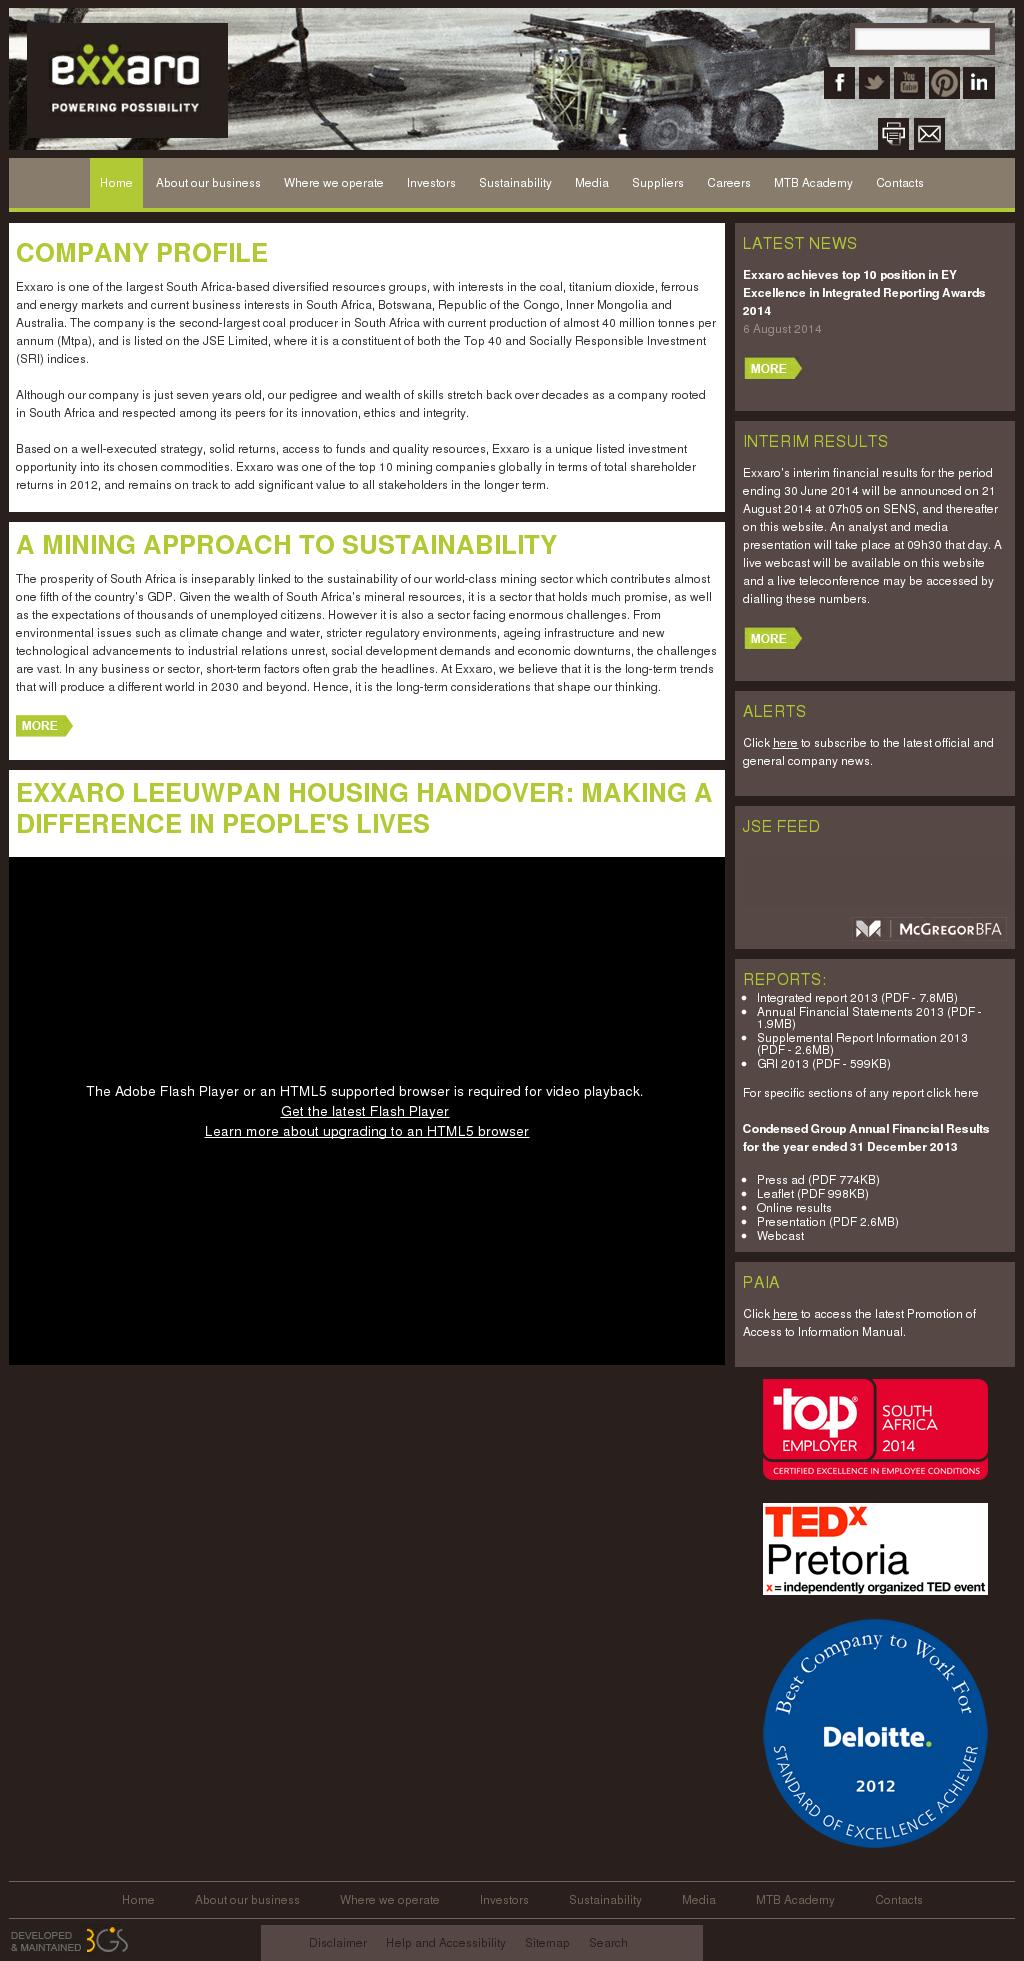 Exxaro Competitors, Revenue and Employees - Owler Company Profile